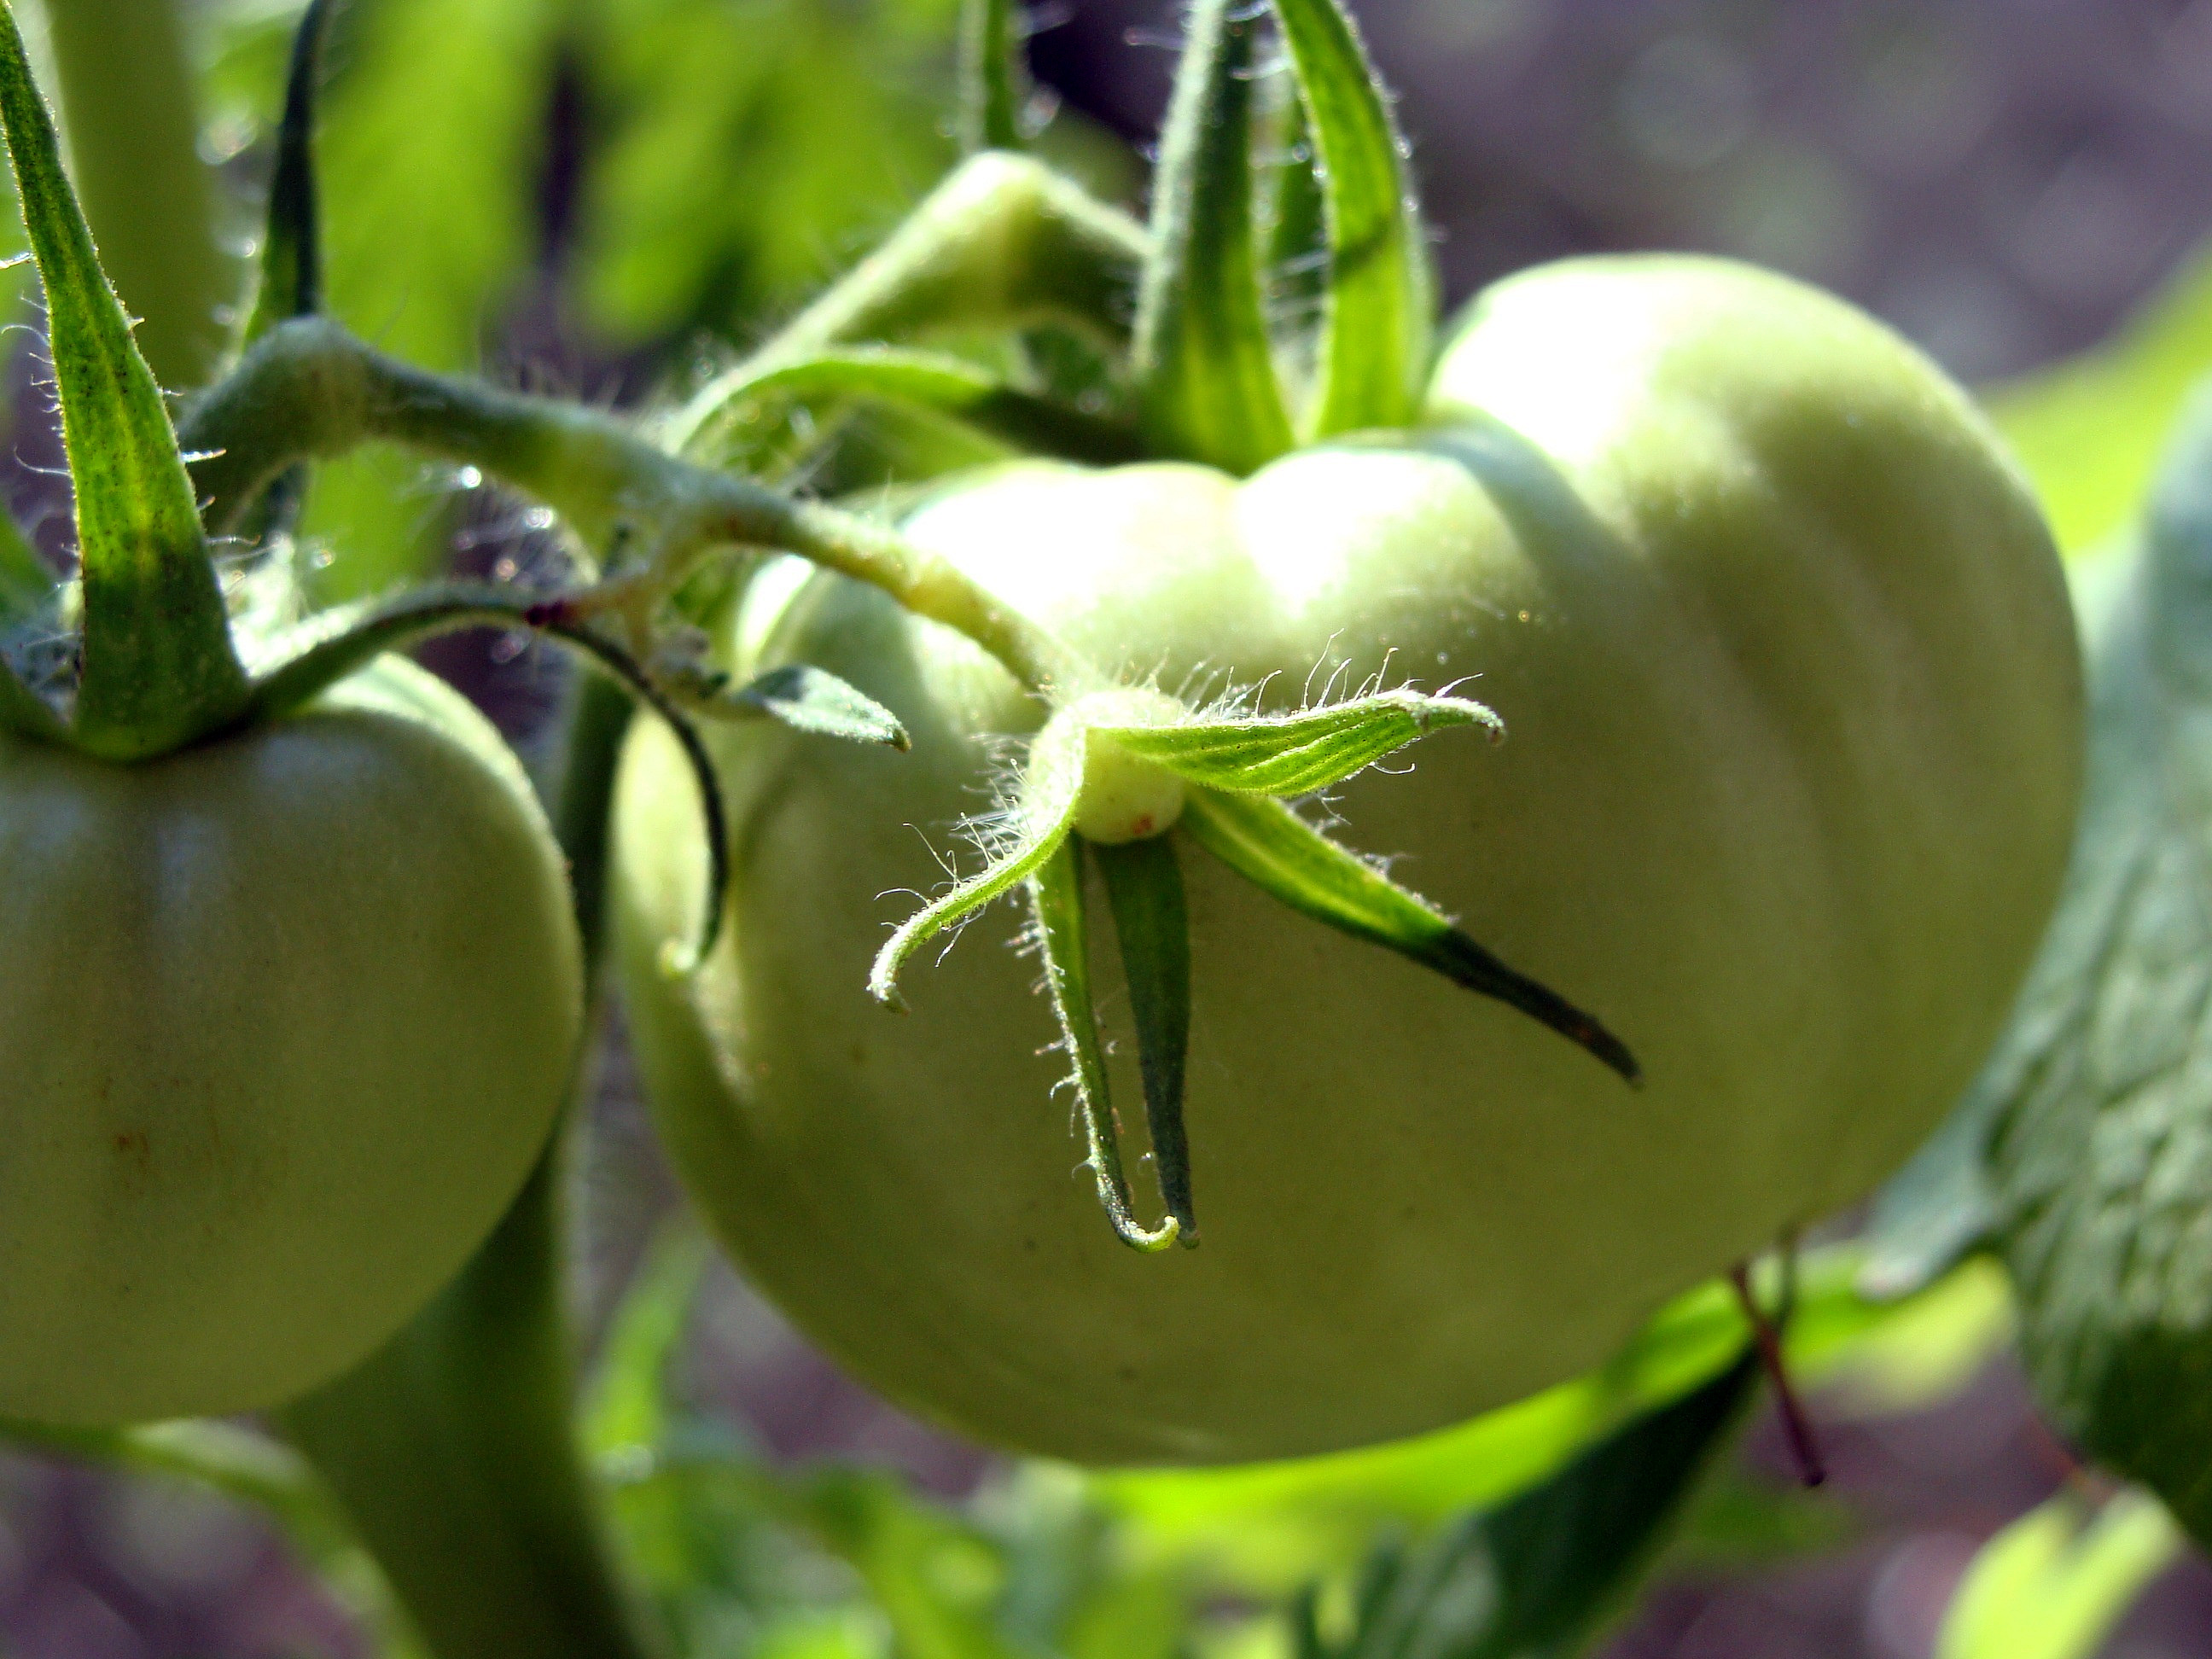 Tomatoes08.01